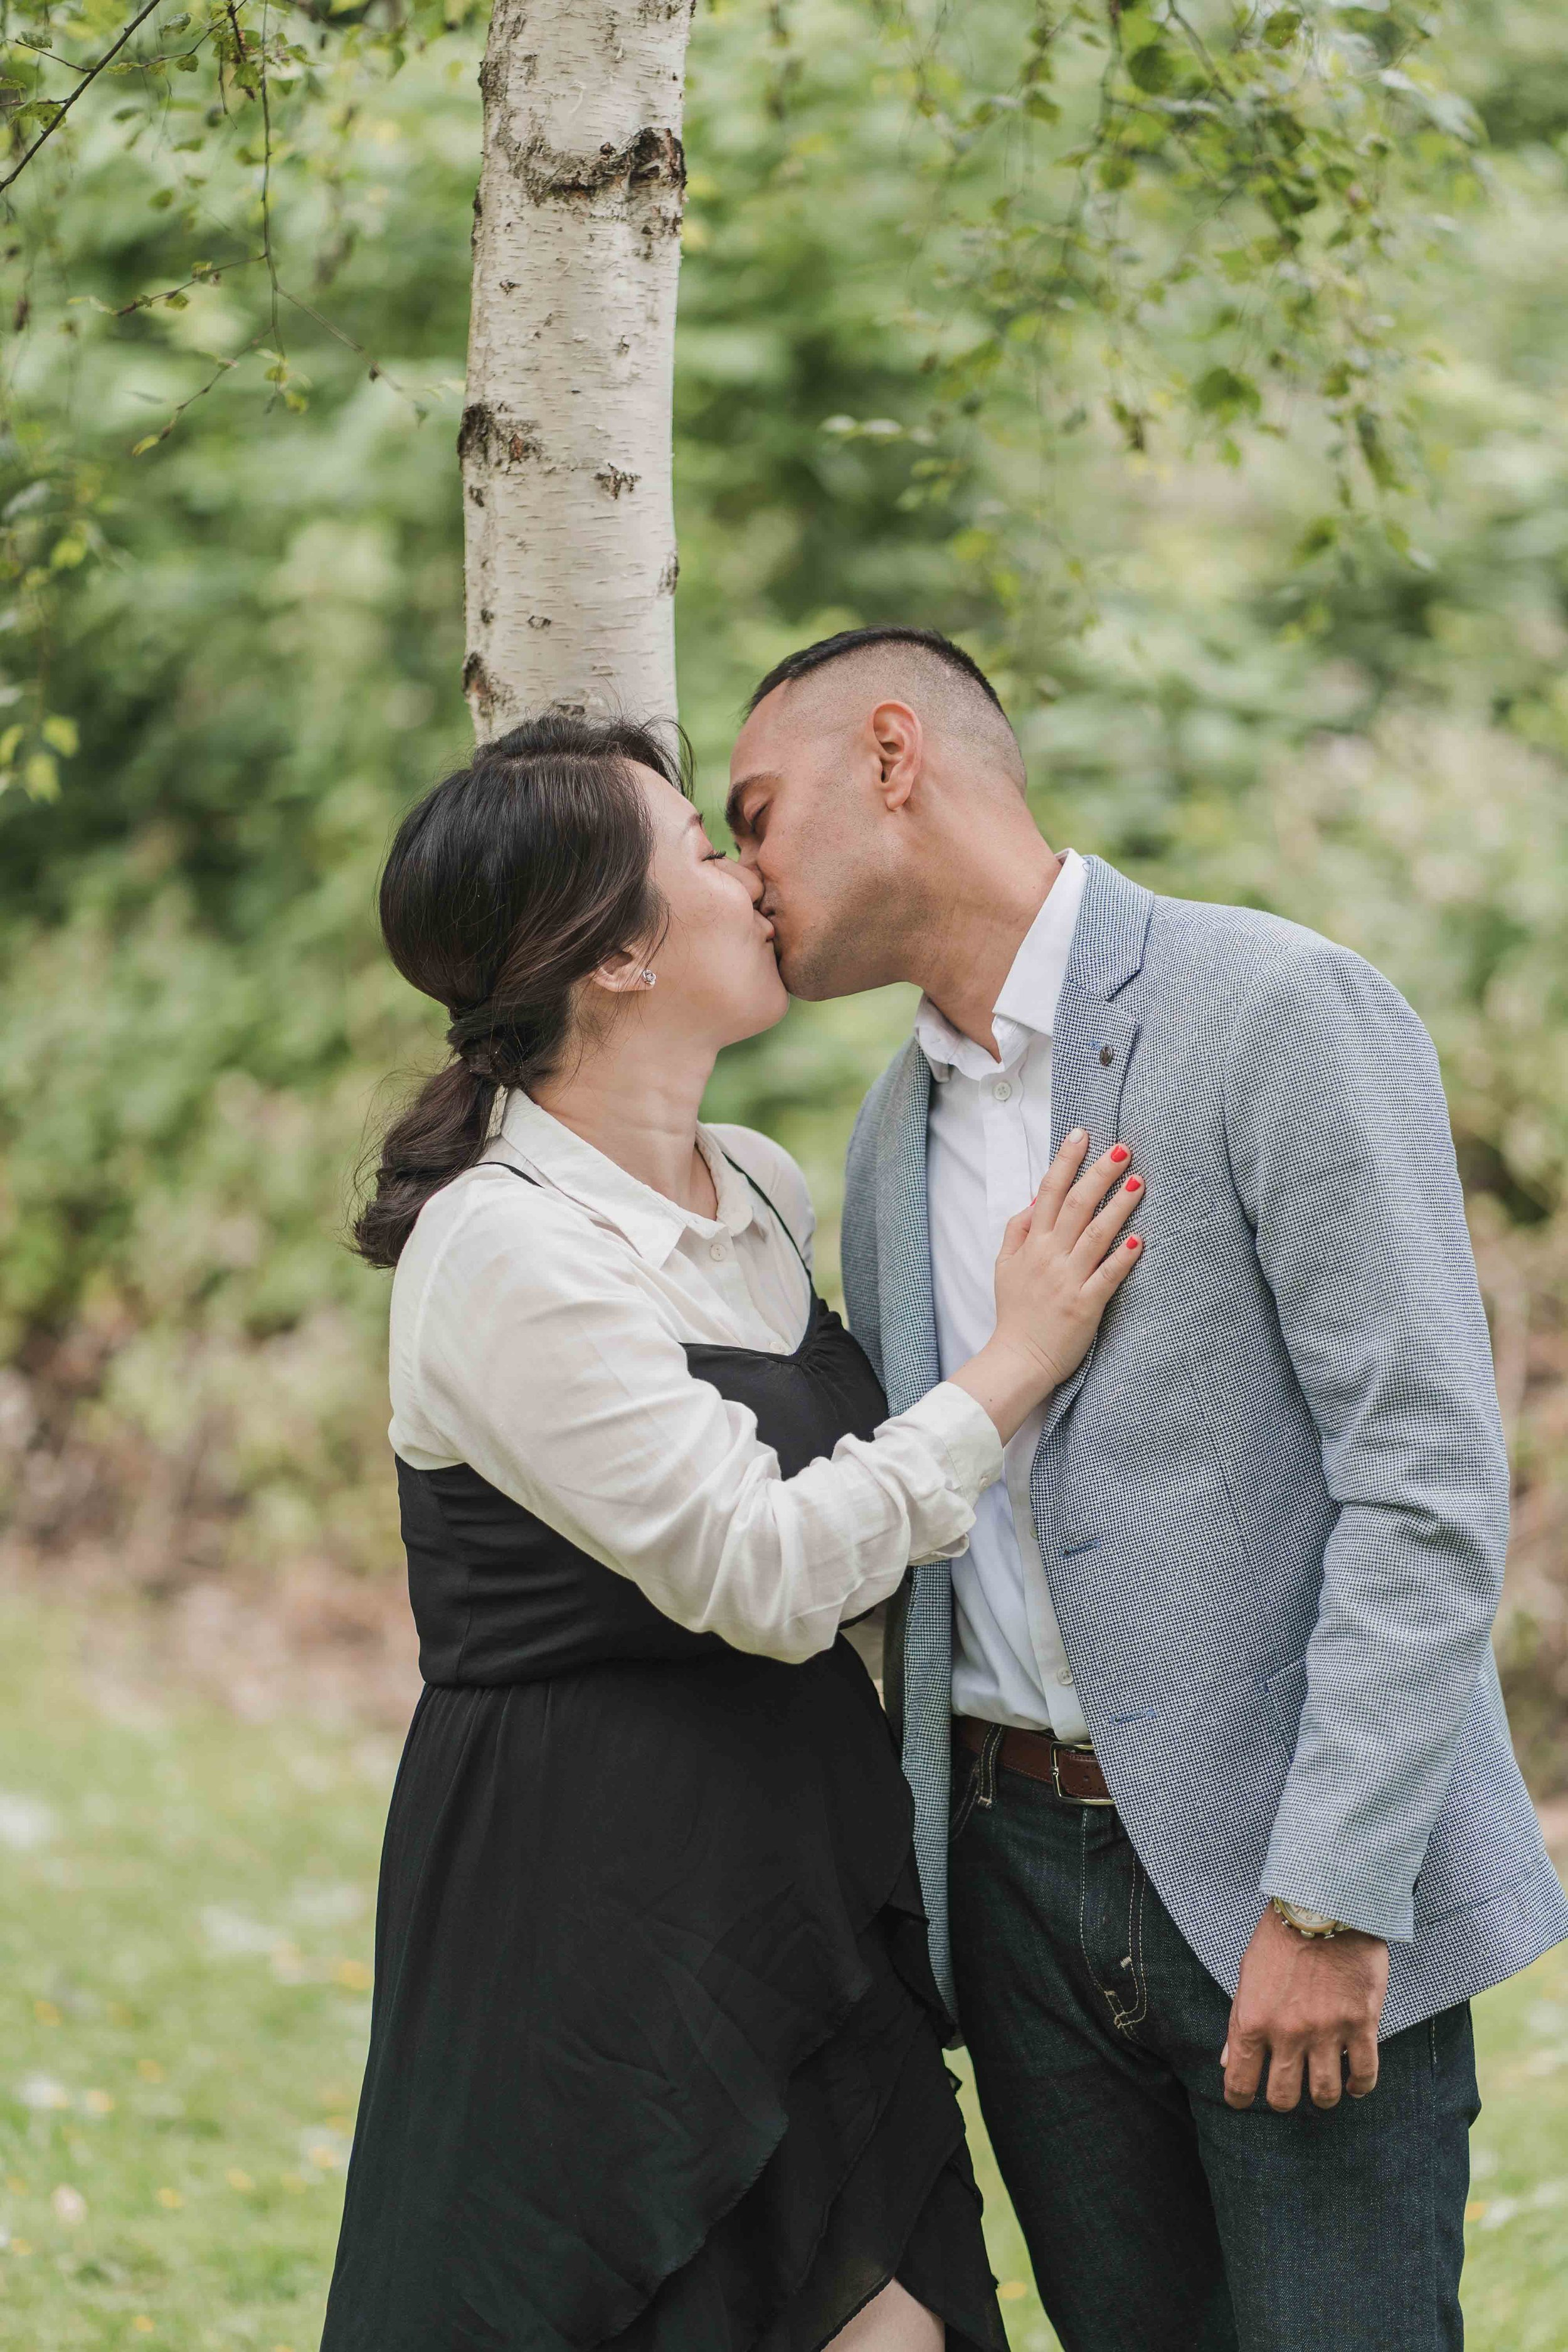 20190622 - Monika & Johnson Engagement - 0169.jpg